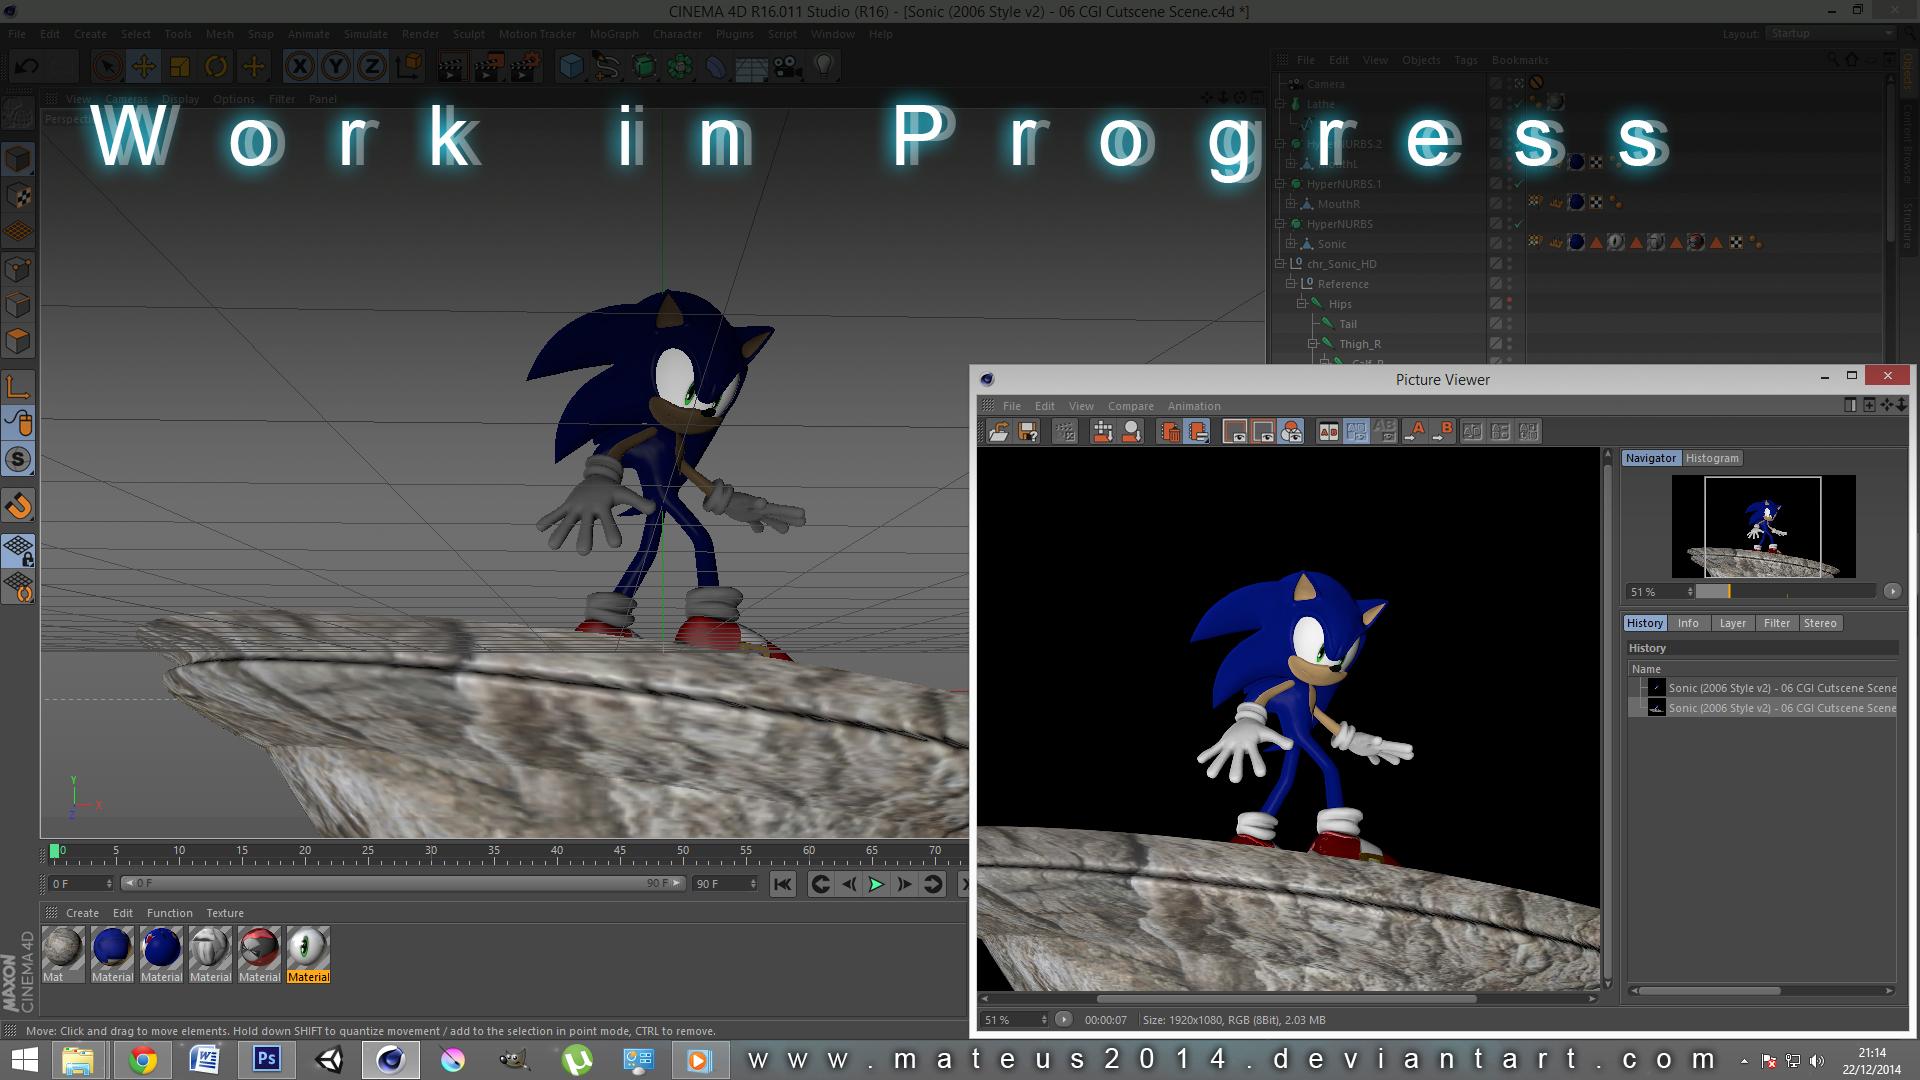 Sonic 06 Cutscene Pose WIP By Mateus2014 On DeviantArt